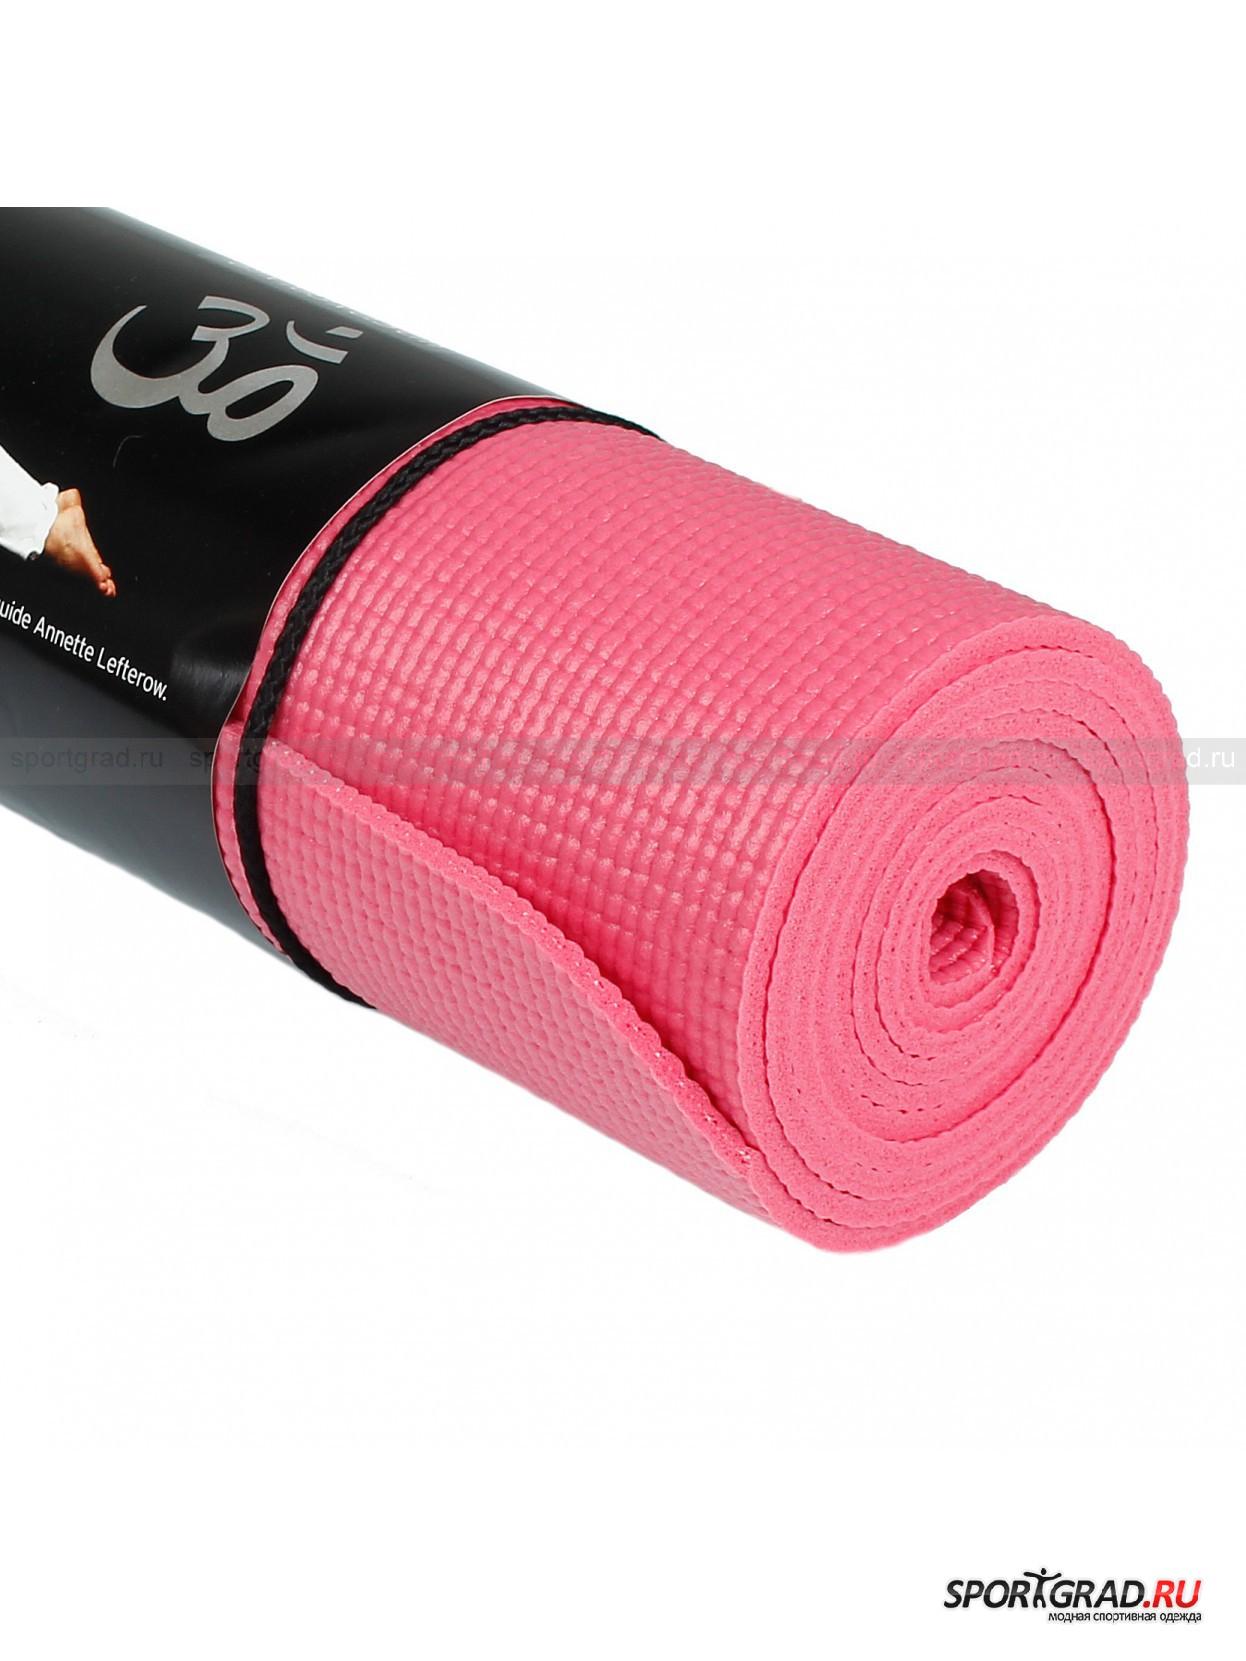 Мат для йоги Yoga mat 5 mm CASALL от Спортград